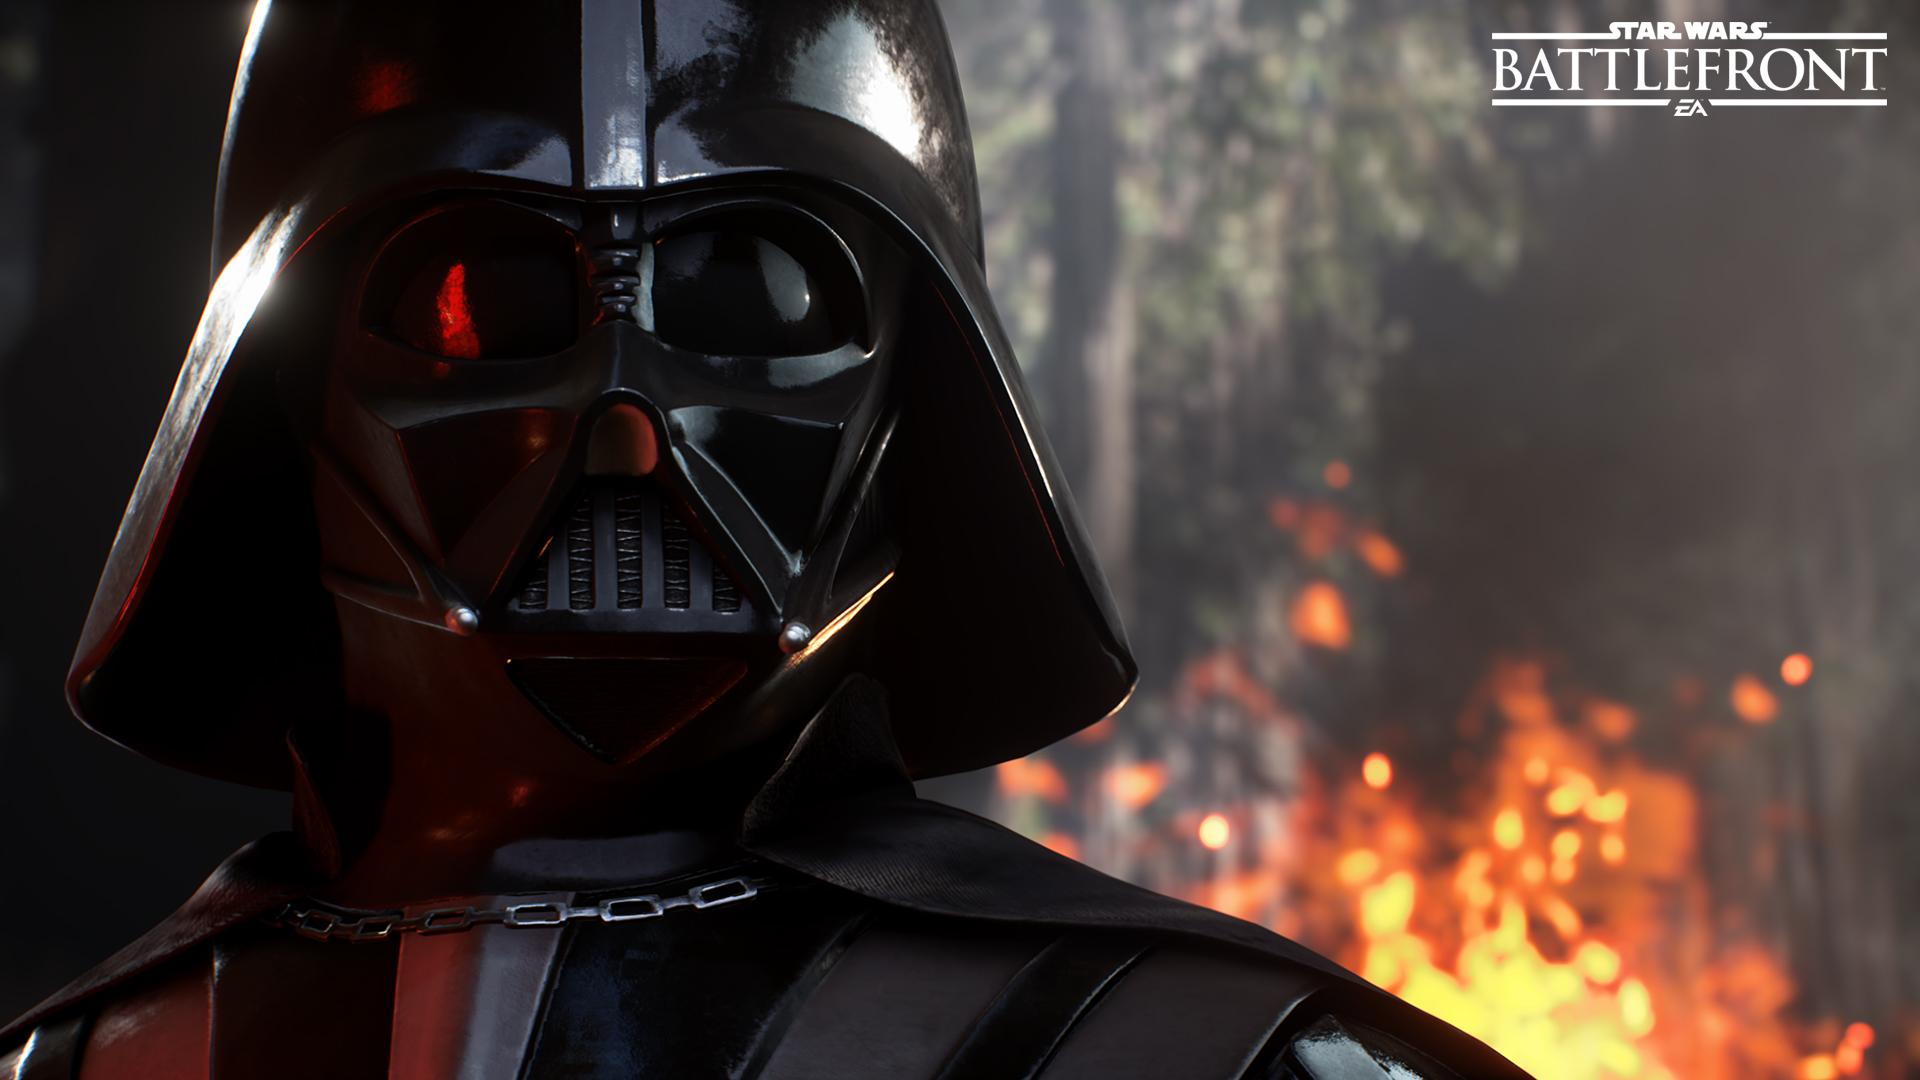 star-wars-battlefront-170415 1